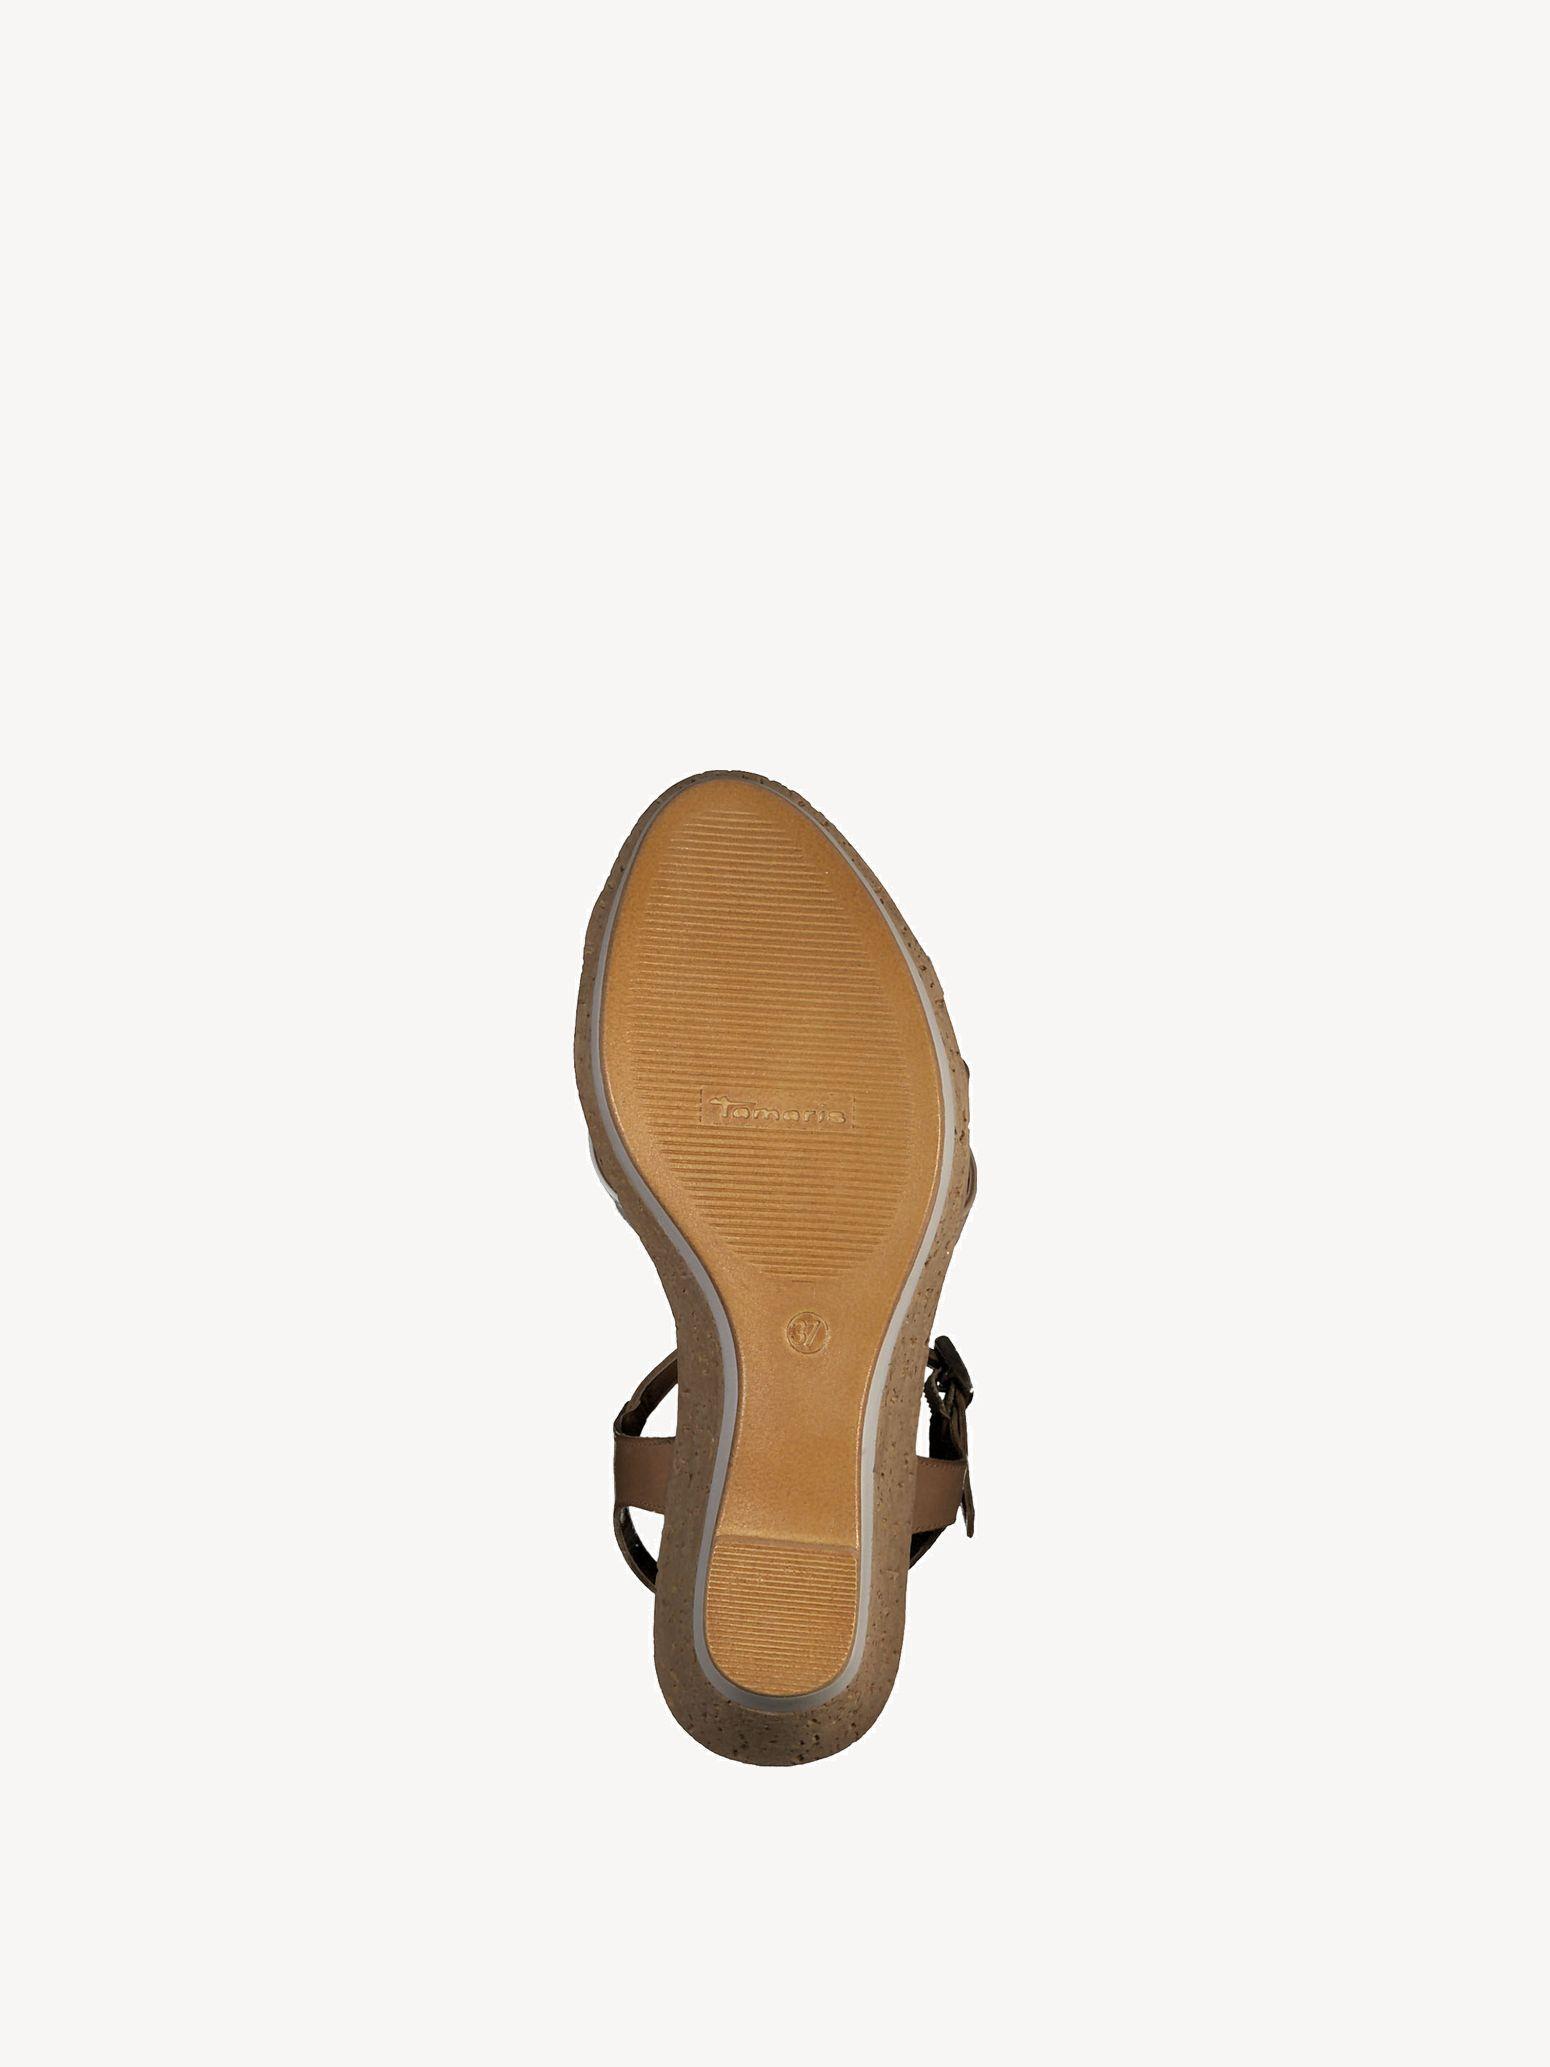 tamaris sneaker schwarz 38, Tamaris keilsandalette cognac